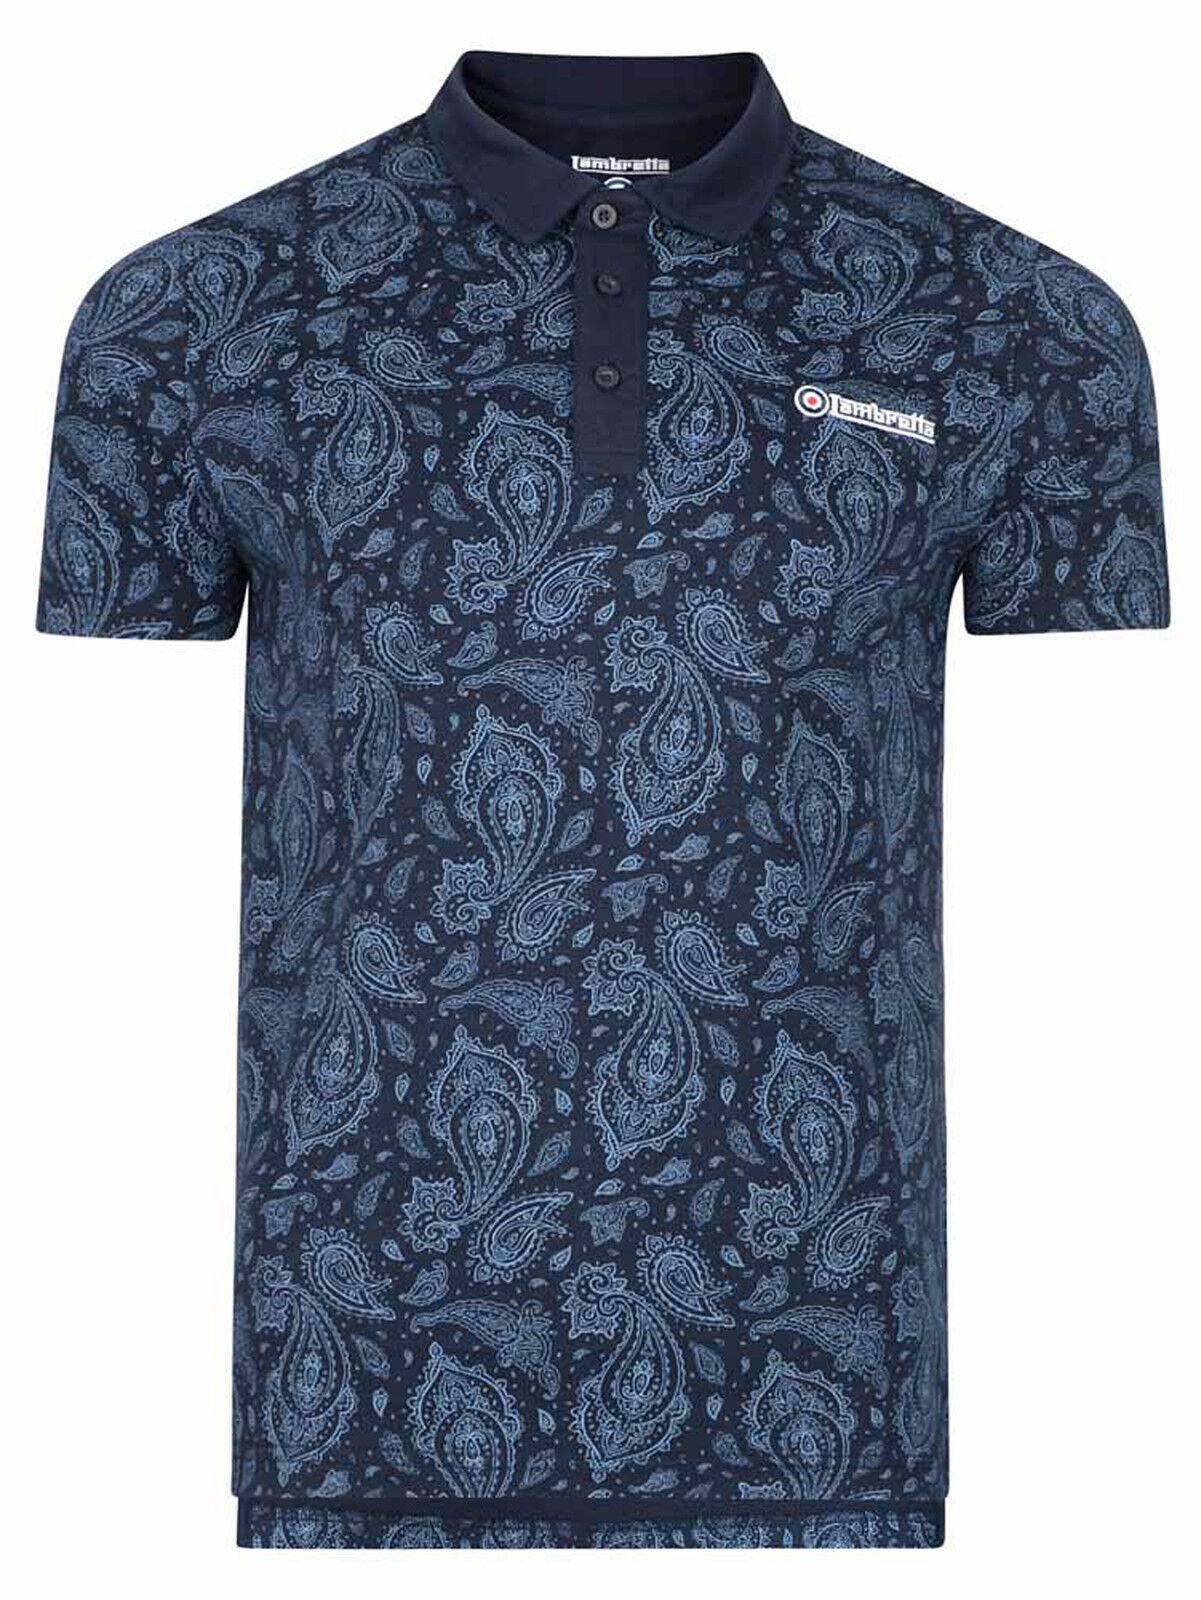 Mens Lambretta Retro style Polo Shirts Summer Casual Top Tee Shirt